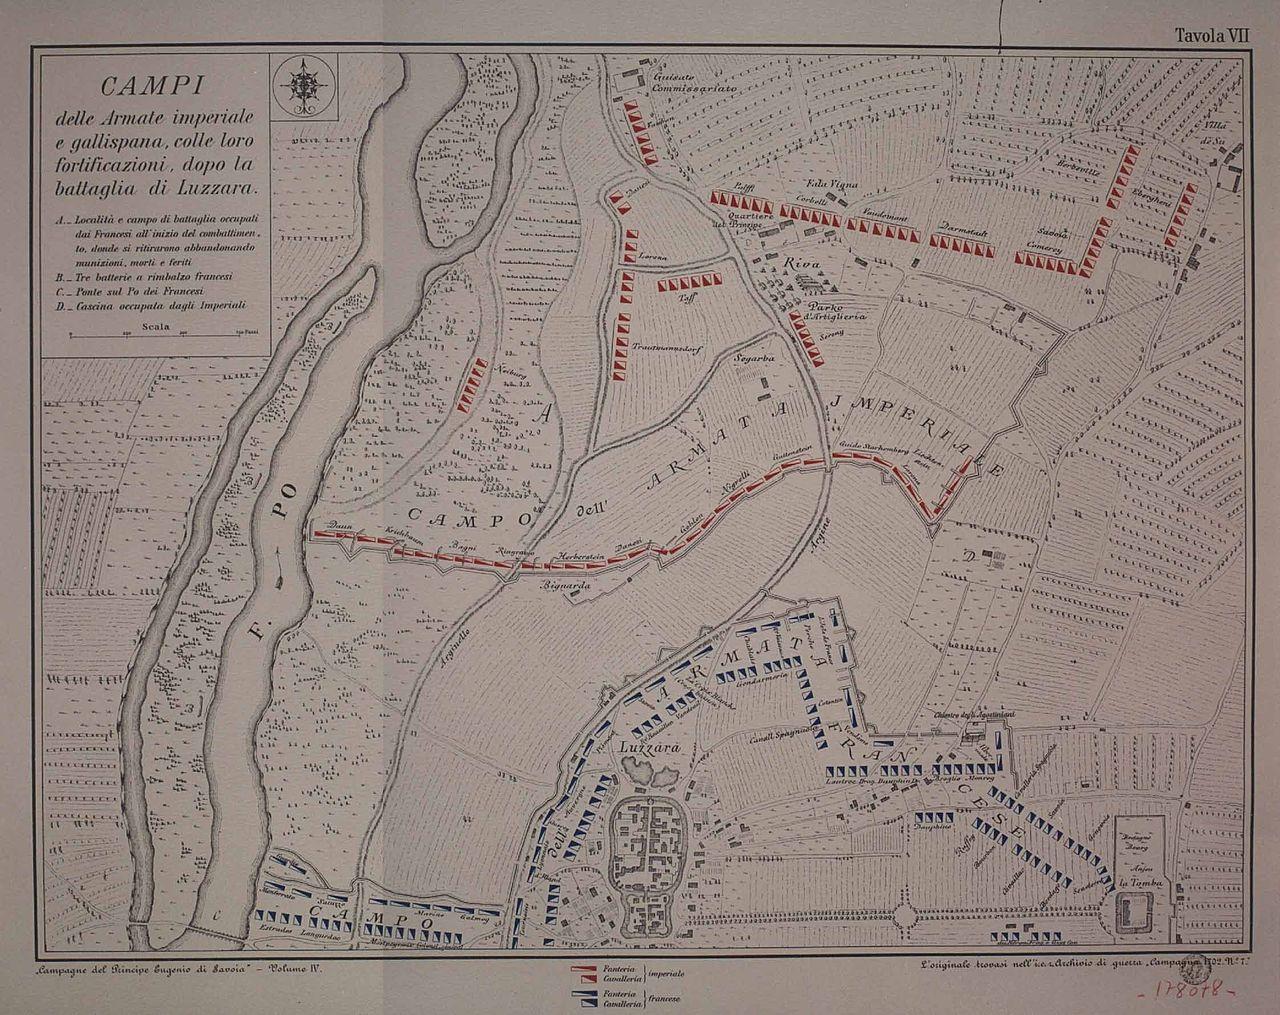 Slagplan fra slaget ved Luzzara.